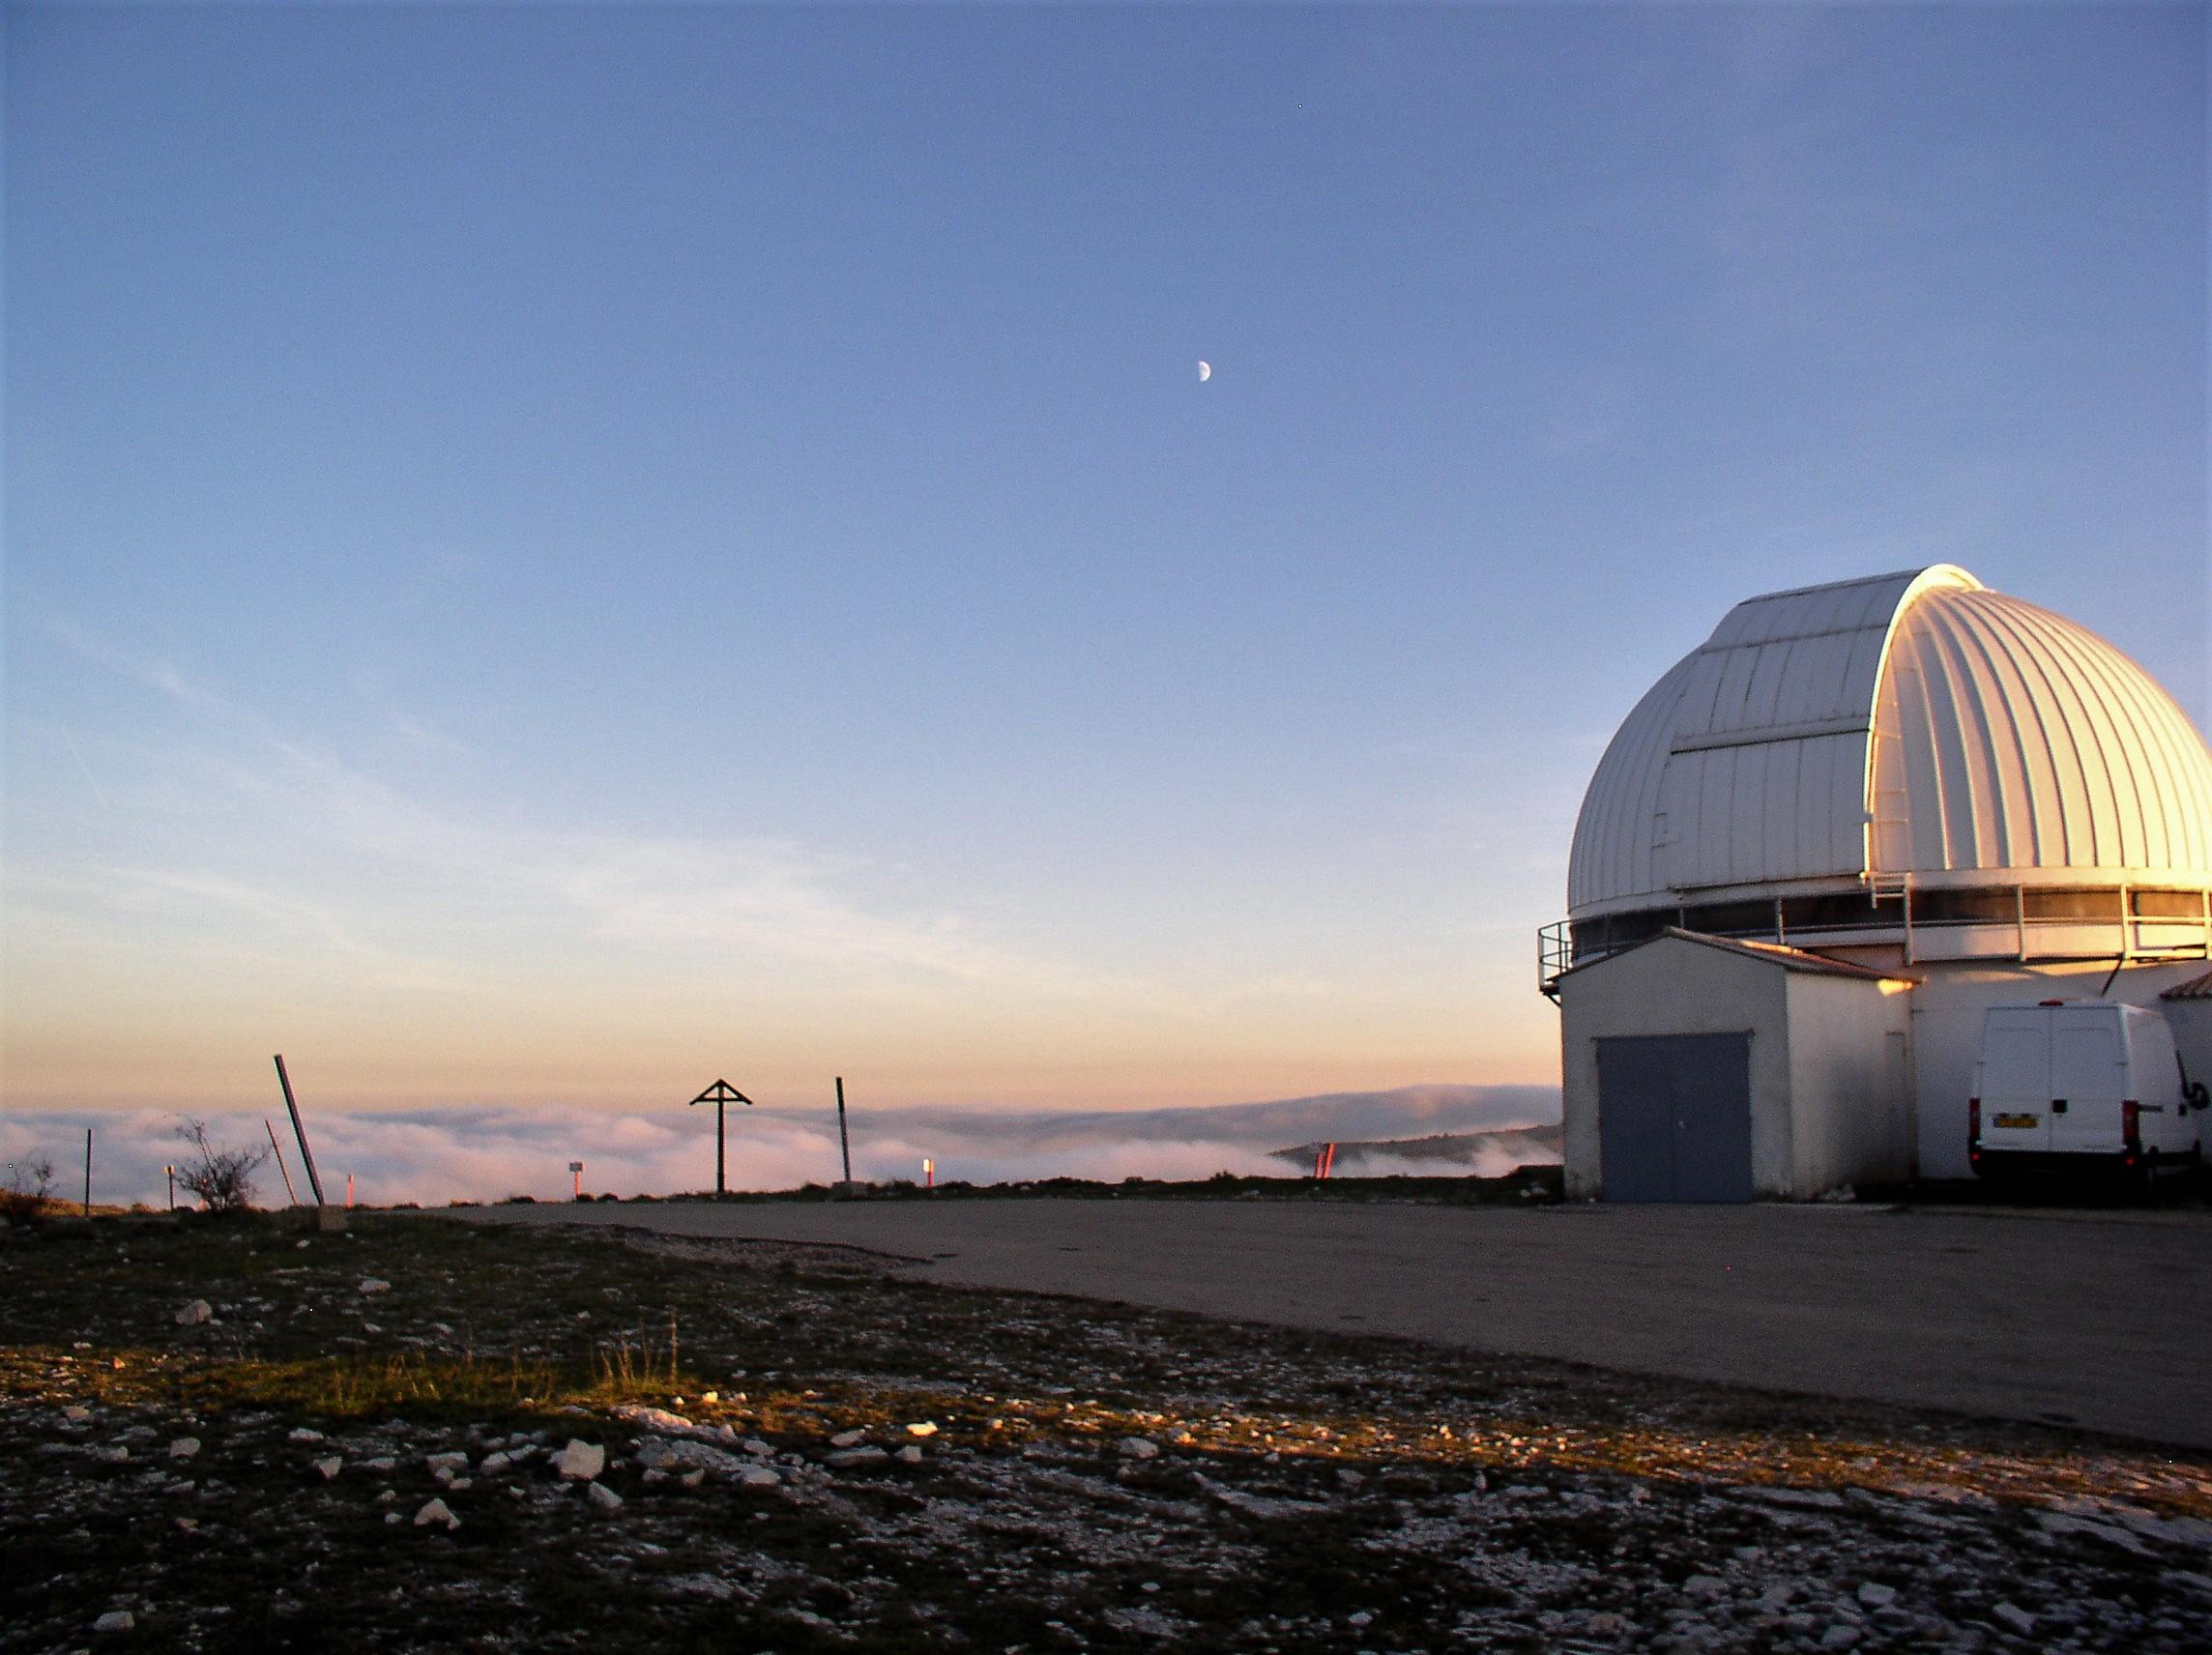 Observatoire de Calern - Caussols